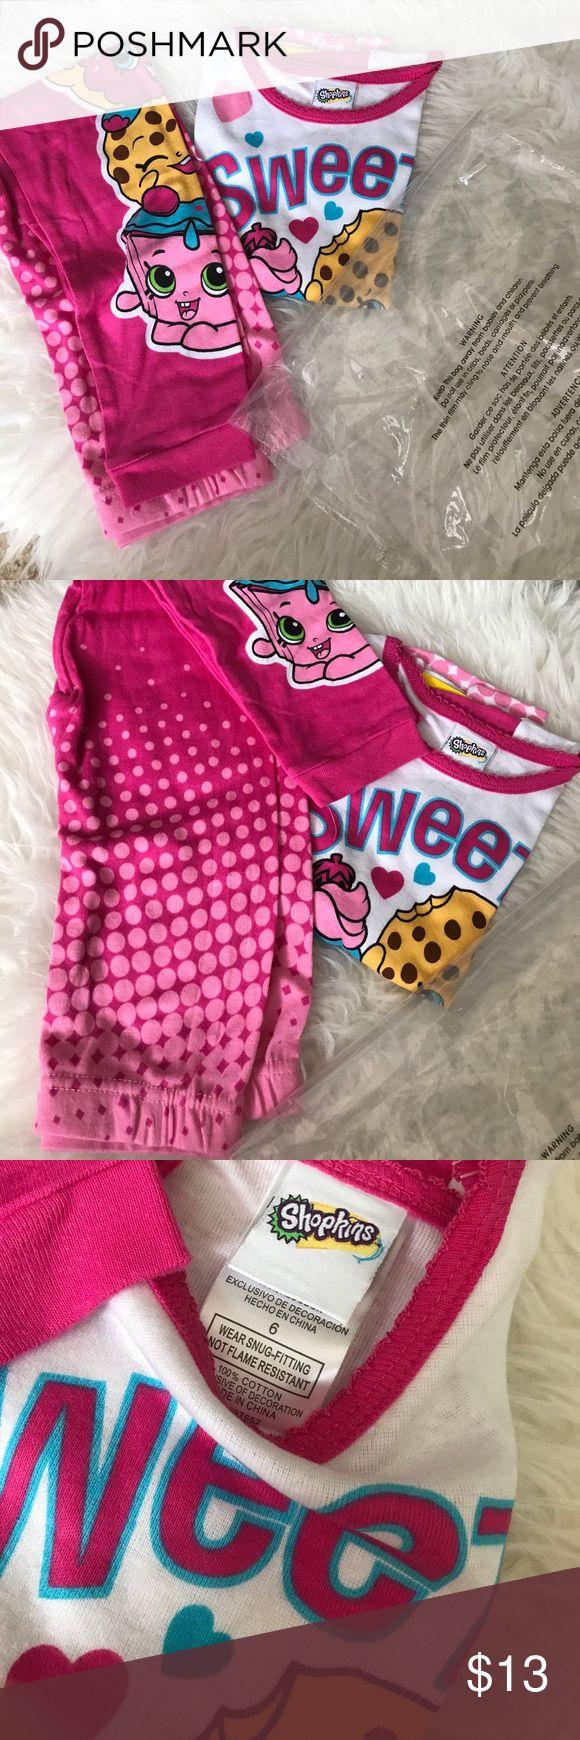 🆕Shopkins Pajama set size 6 New no tags, girls pajamas set with pants and short sleeve tee size 6 shopkins Pajamas Pajama Sets